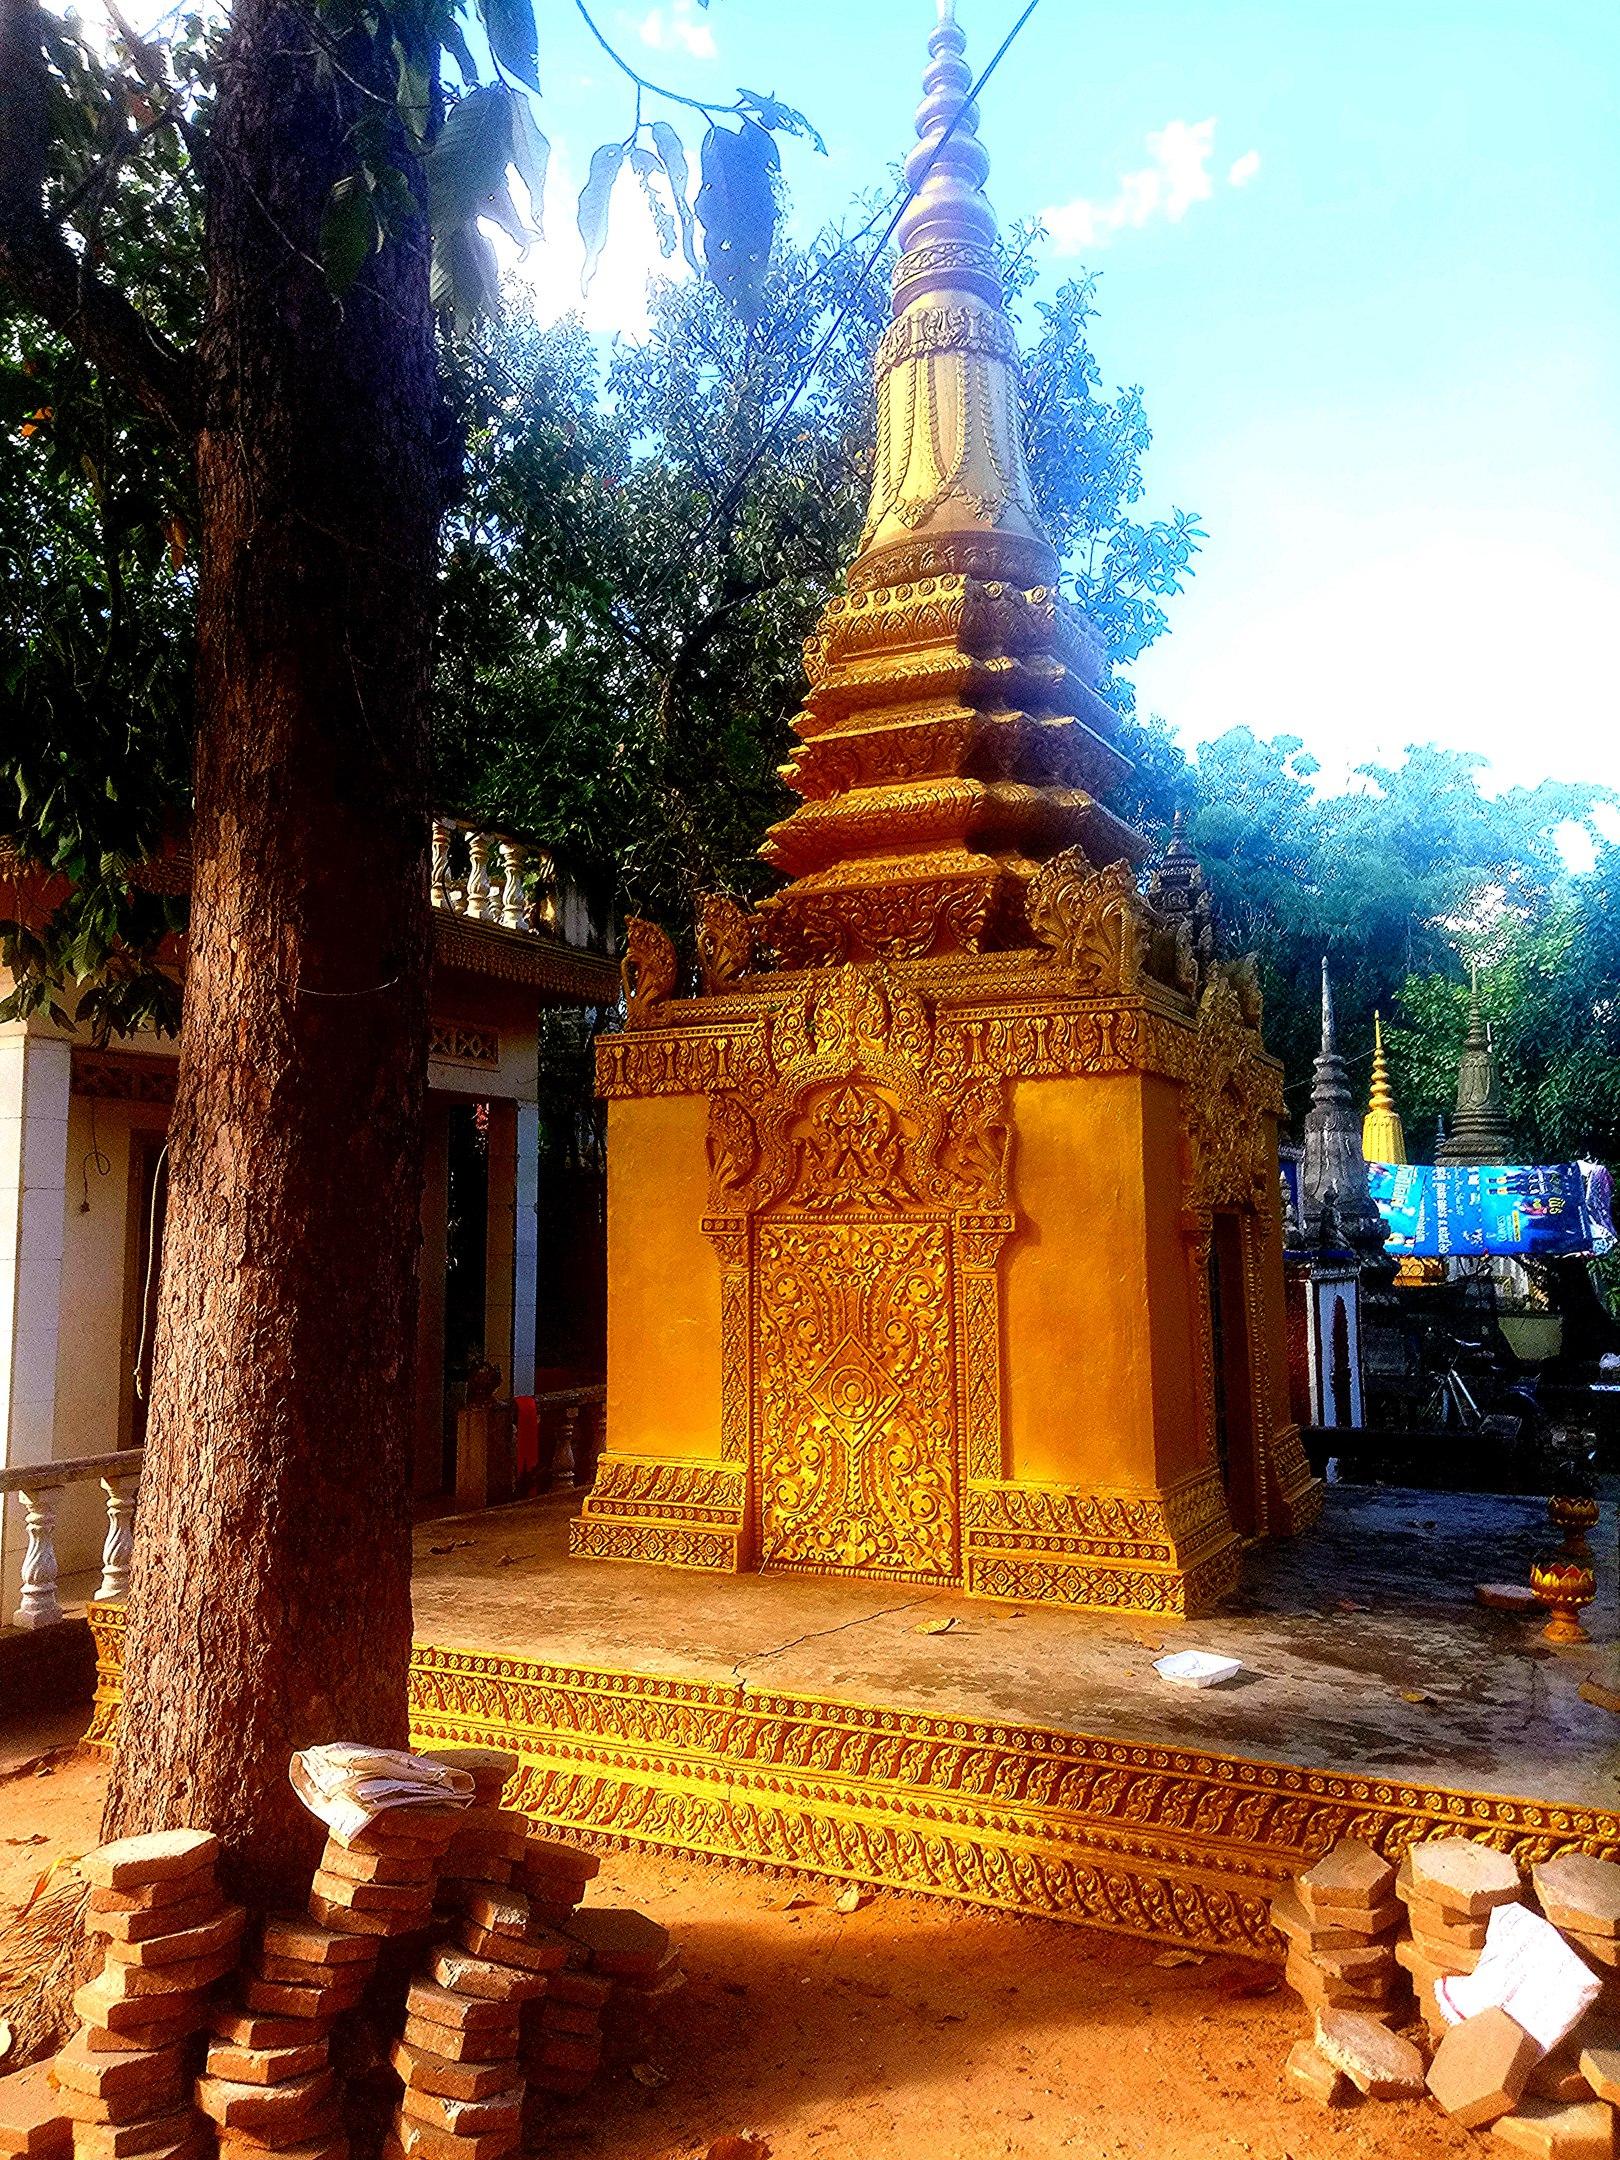 travel - Елена Руденко (Валтея). Камбоджа. Сием Рип. BNLiR4xJA1g